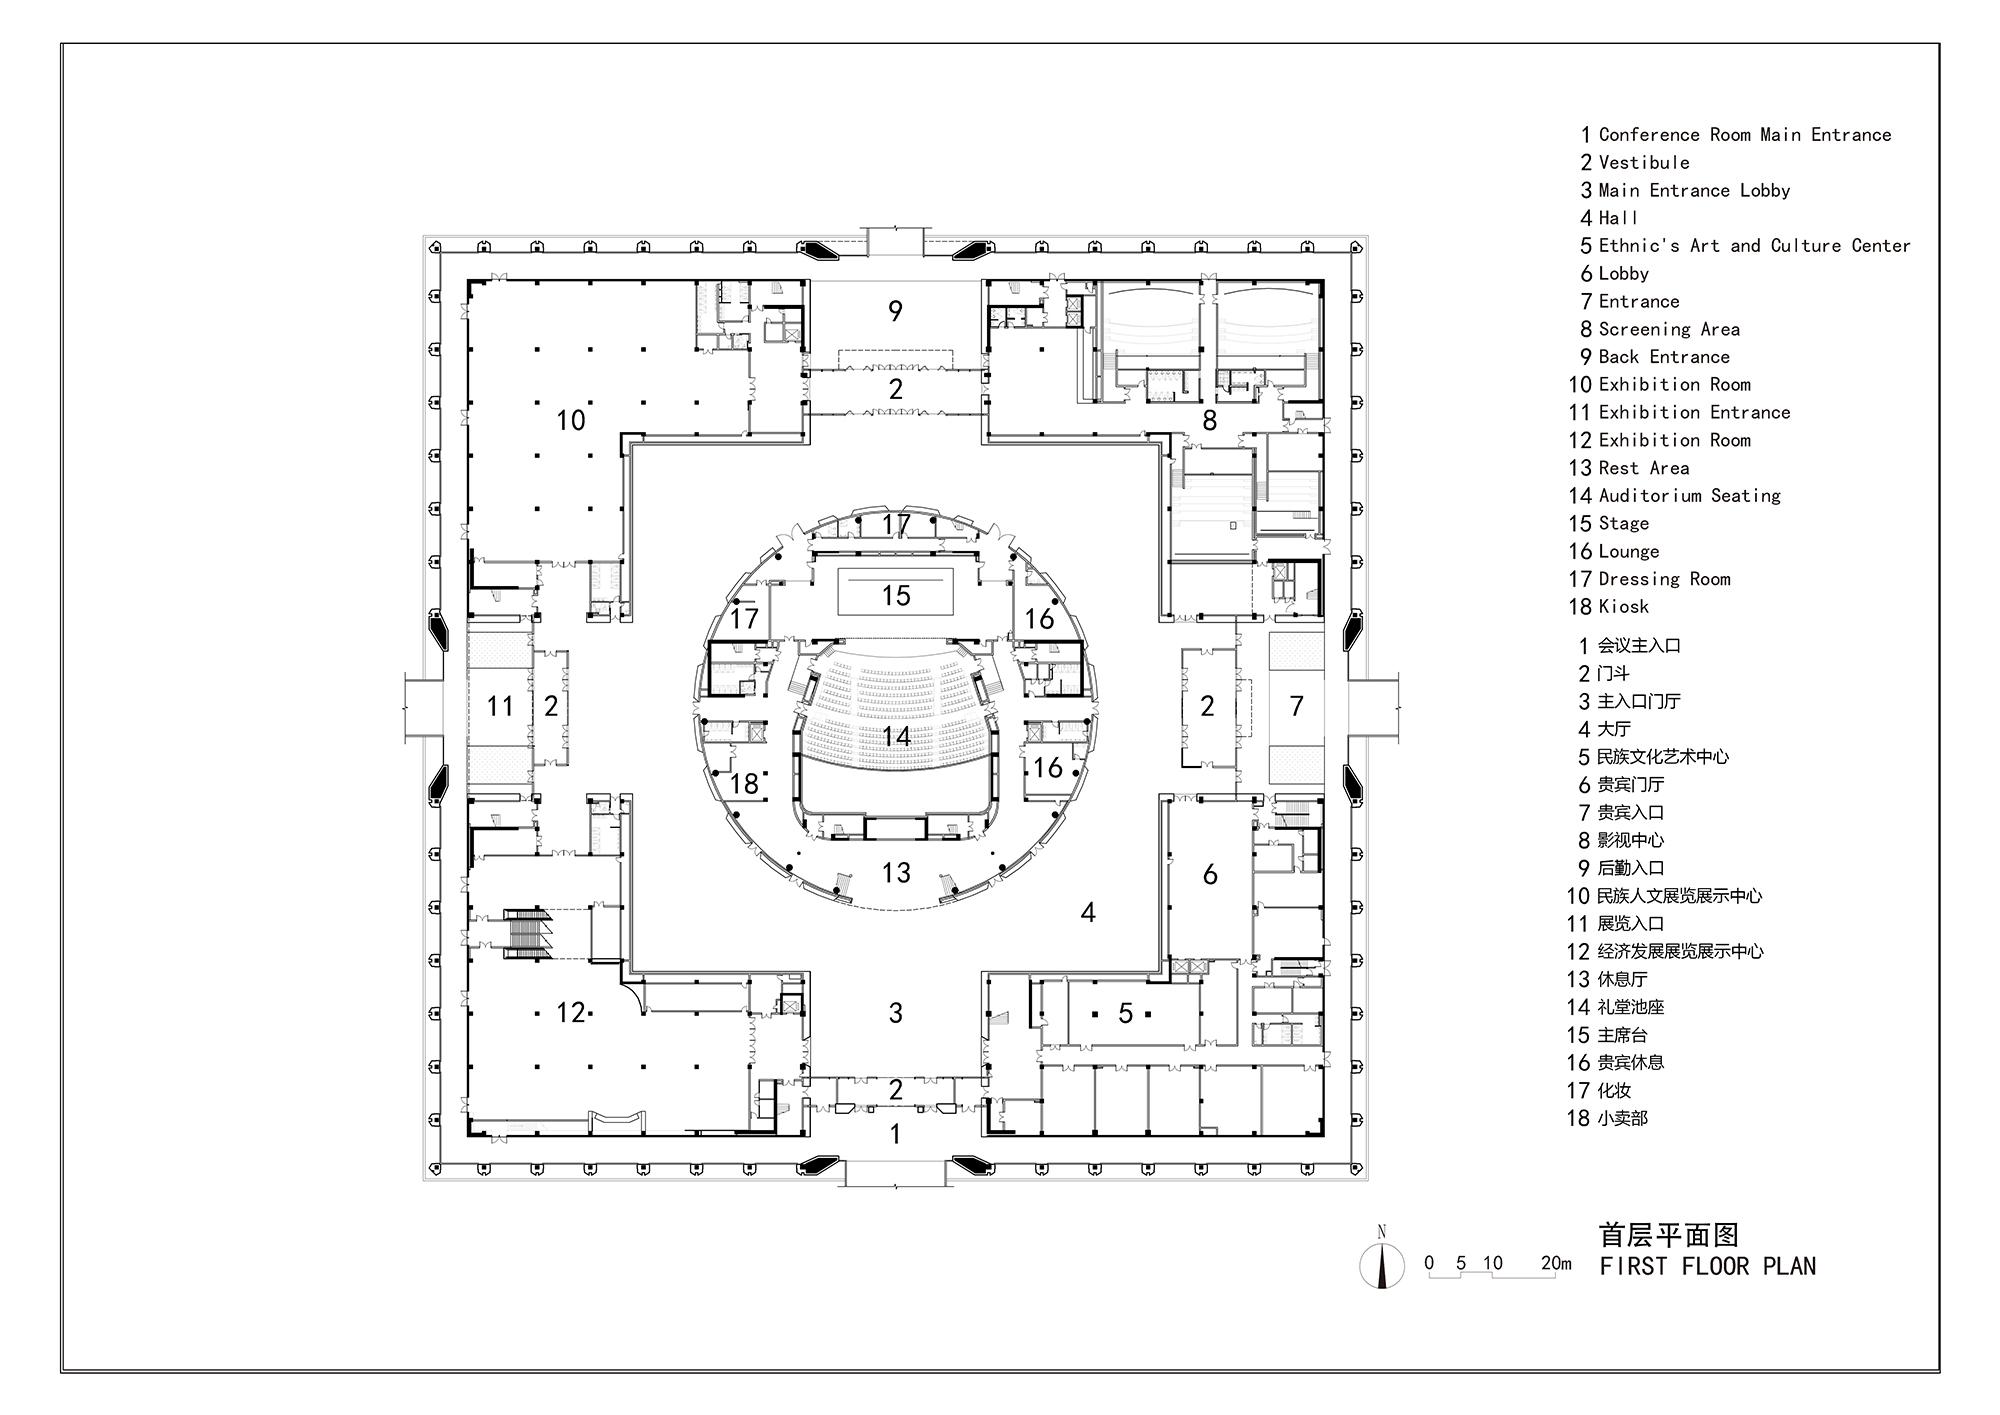 gallery of da chang muslim cultural center architectural design